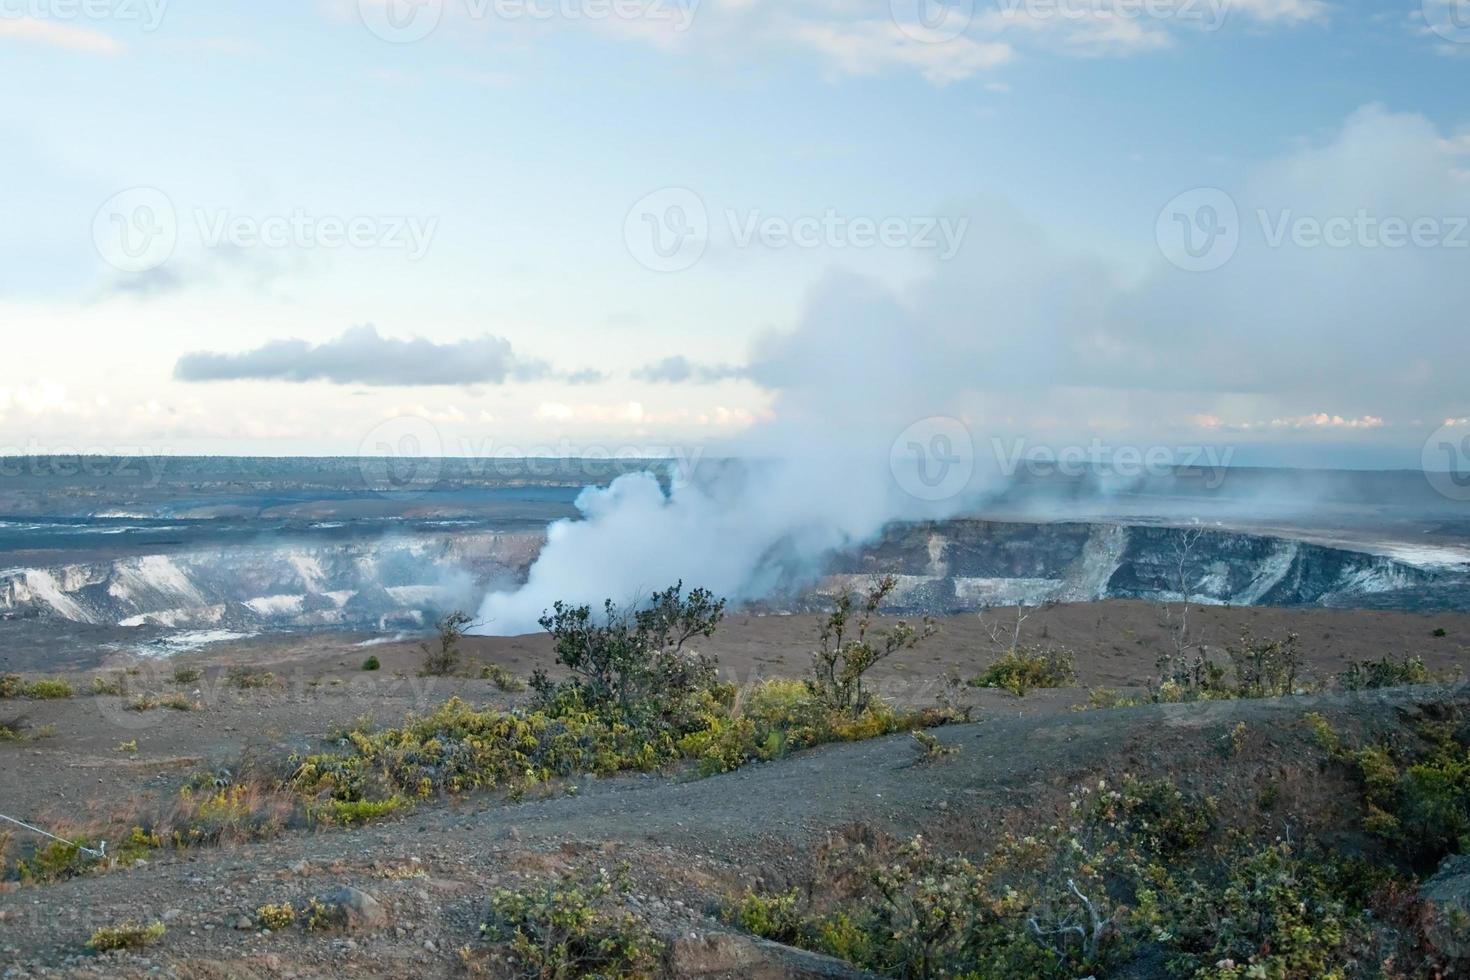 rauchender Krater des Halemaumau Kilauea Vulkans in Hawaii Vulkanen foto